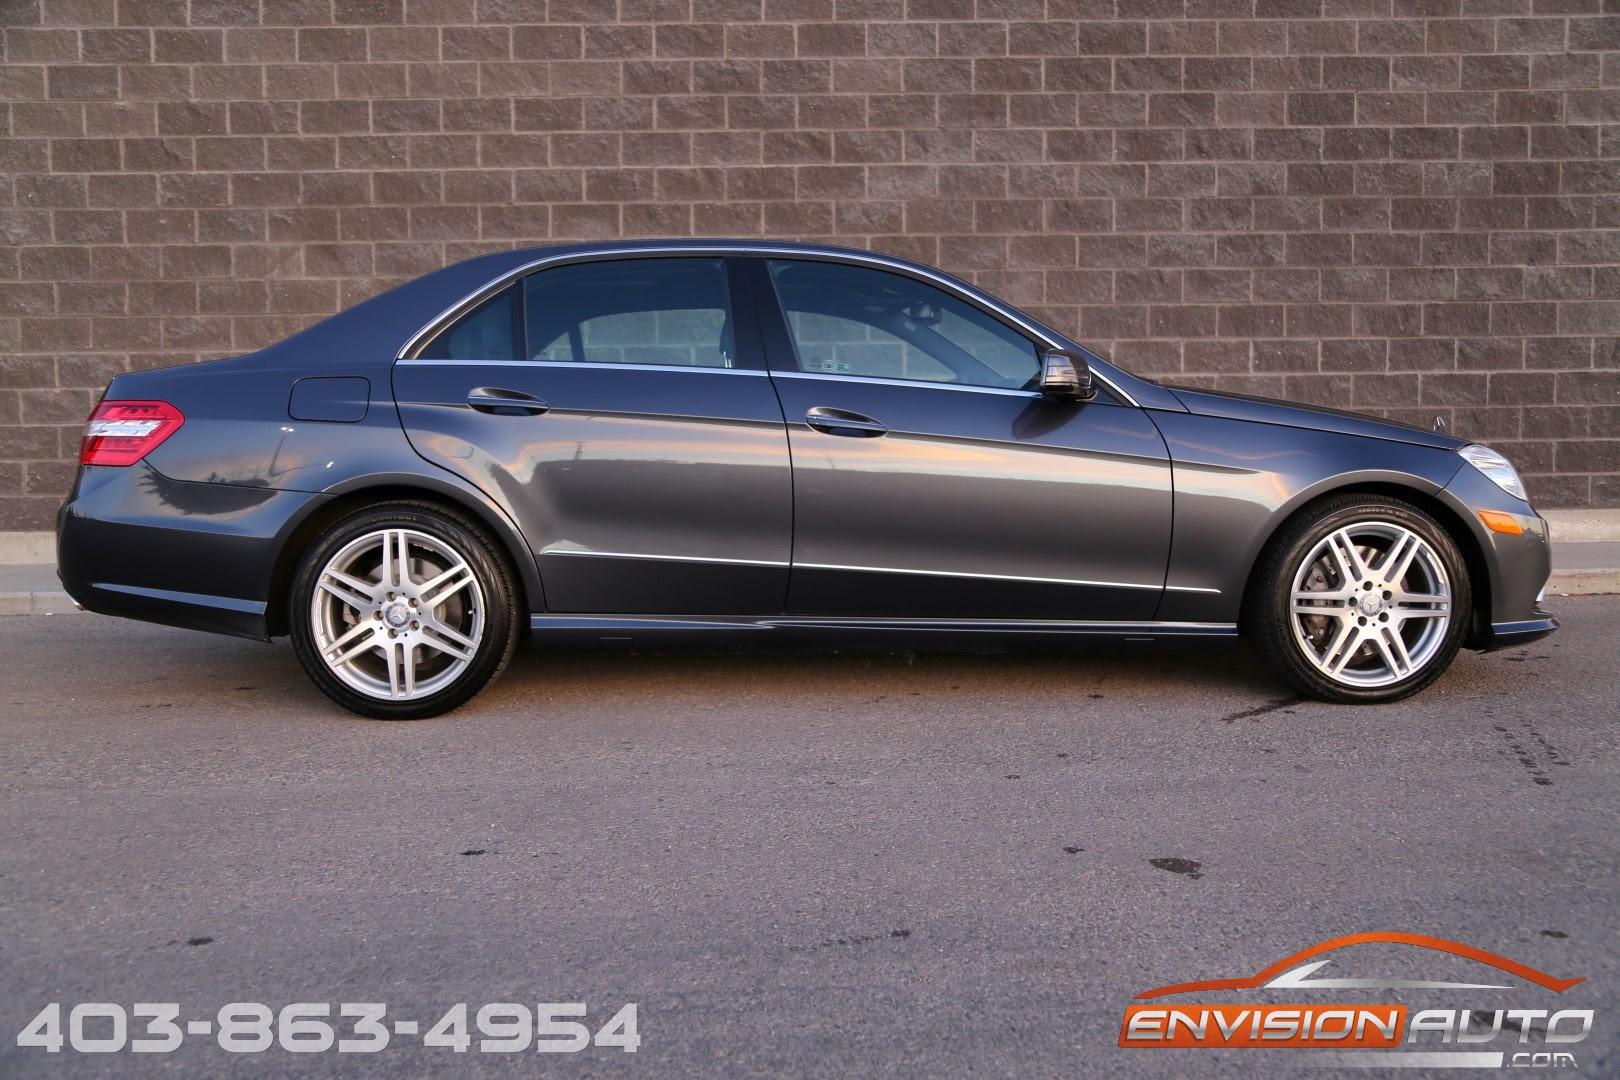 2010 Mercedes-Benz E550 4Matic Spotless History | Envision ...